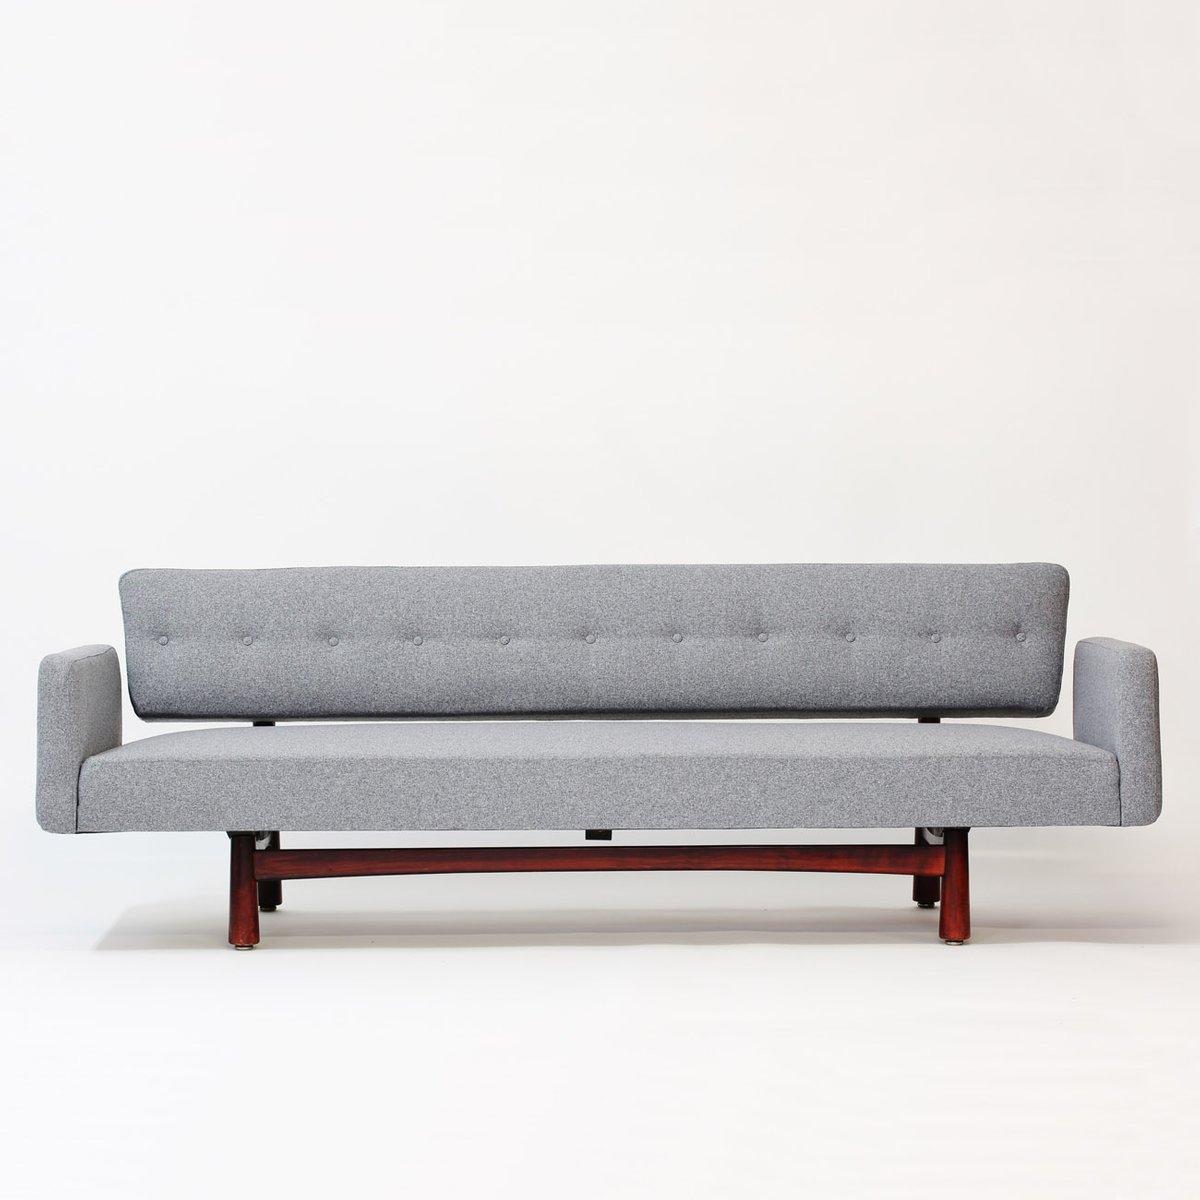 dux sofa uk twill fabric new york by edward wormley for ljungs industrier